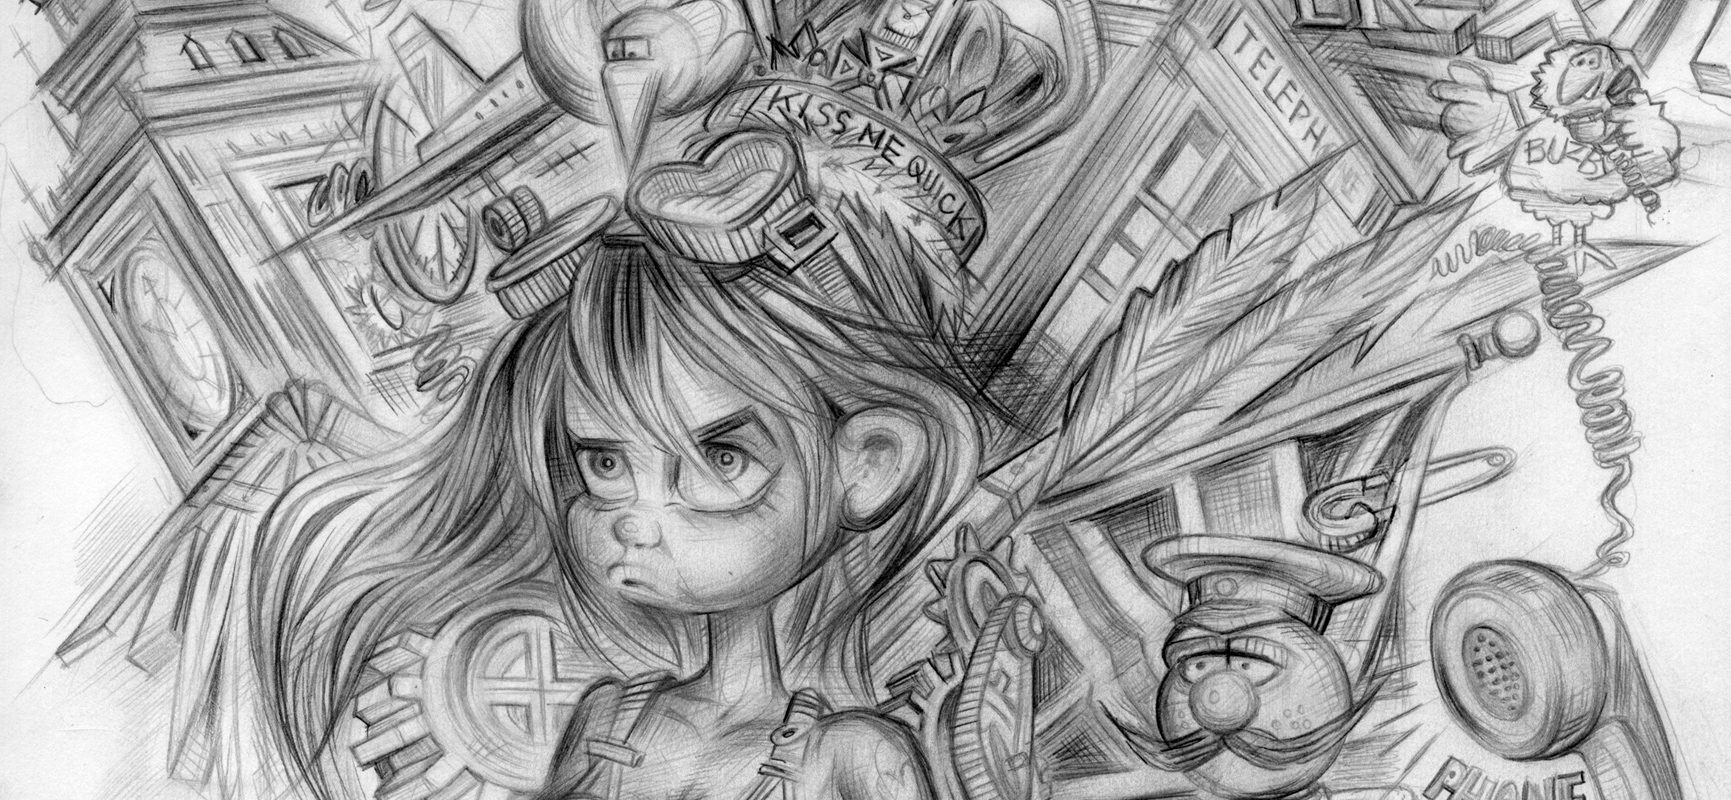 Craig-Everett-artists-original-sketches